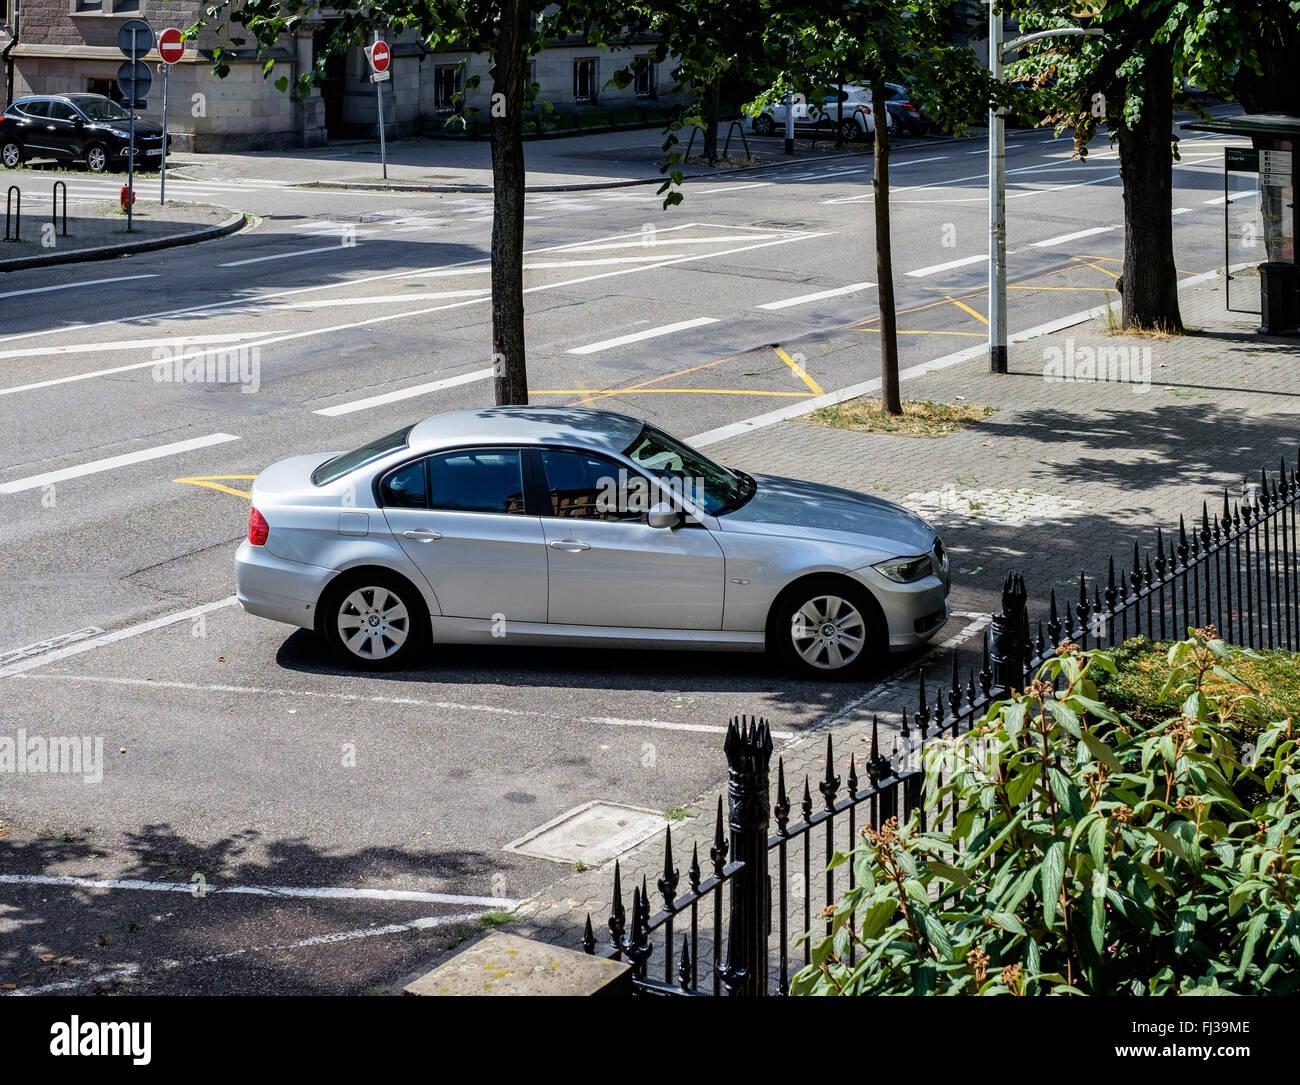 Car parked on pavement, Strasbourg, Alsace, France - Stock Image